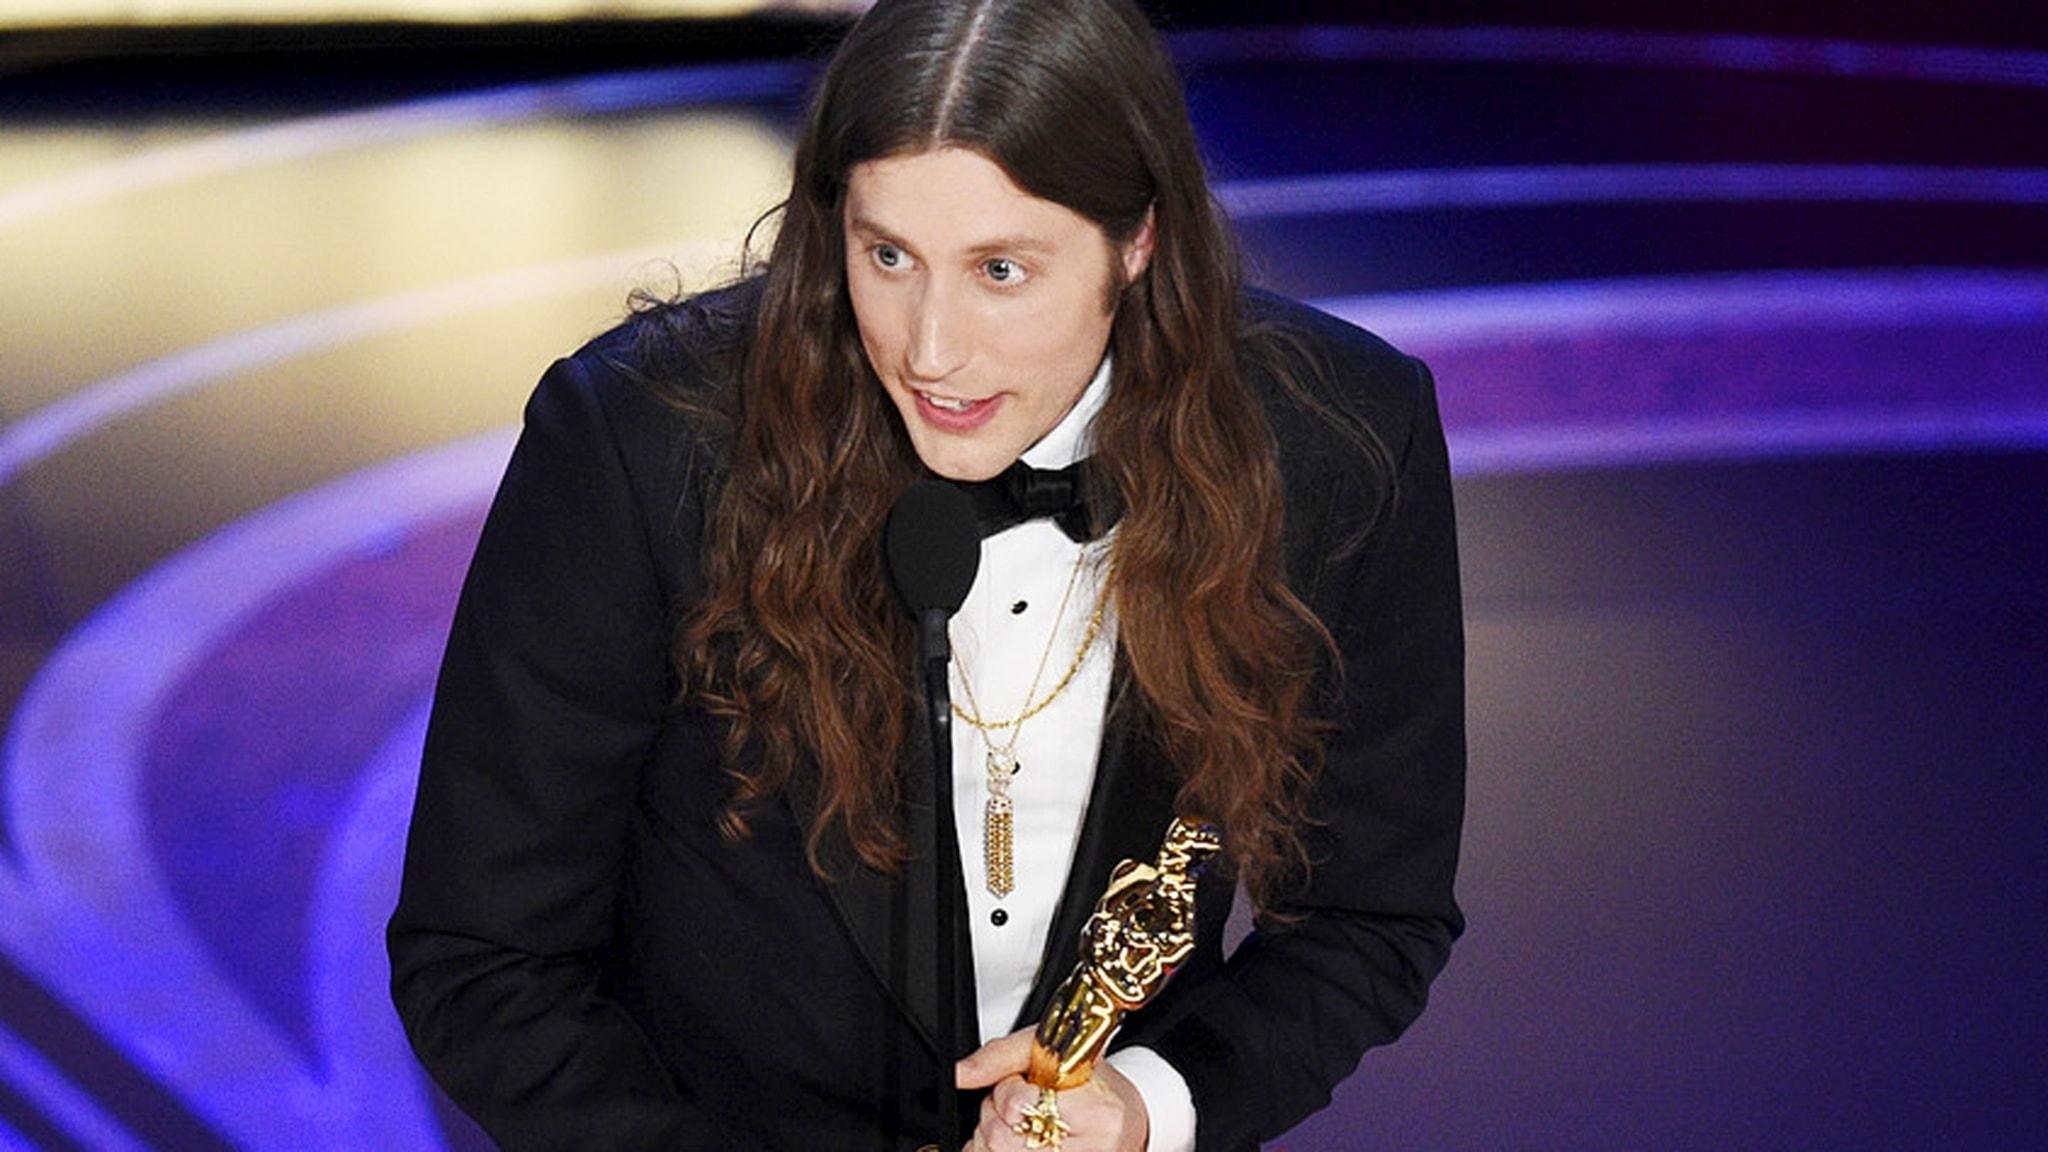 Ludwig Göransson vid Oscarsgalan 2019. Foto: Chris Pizello/AP/TT.